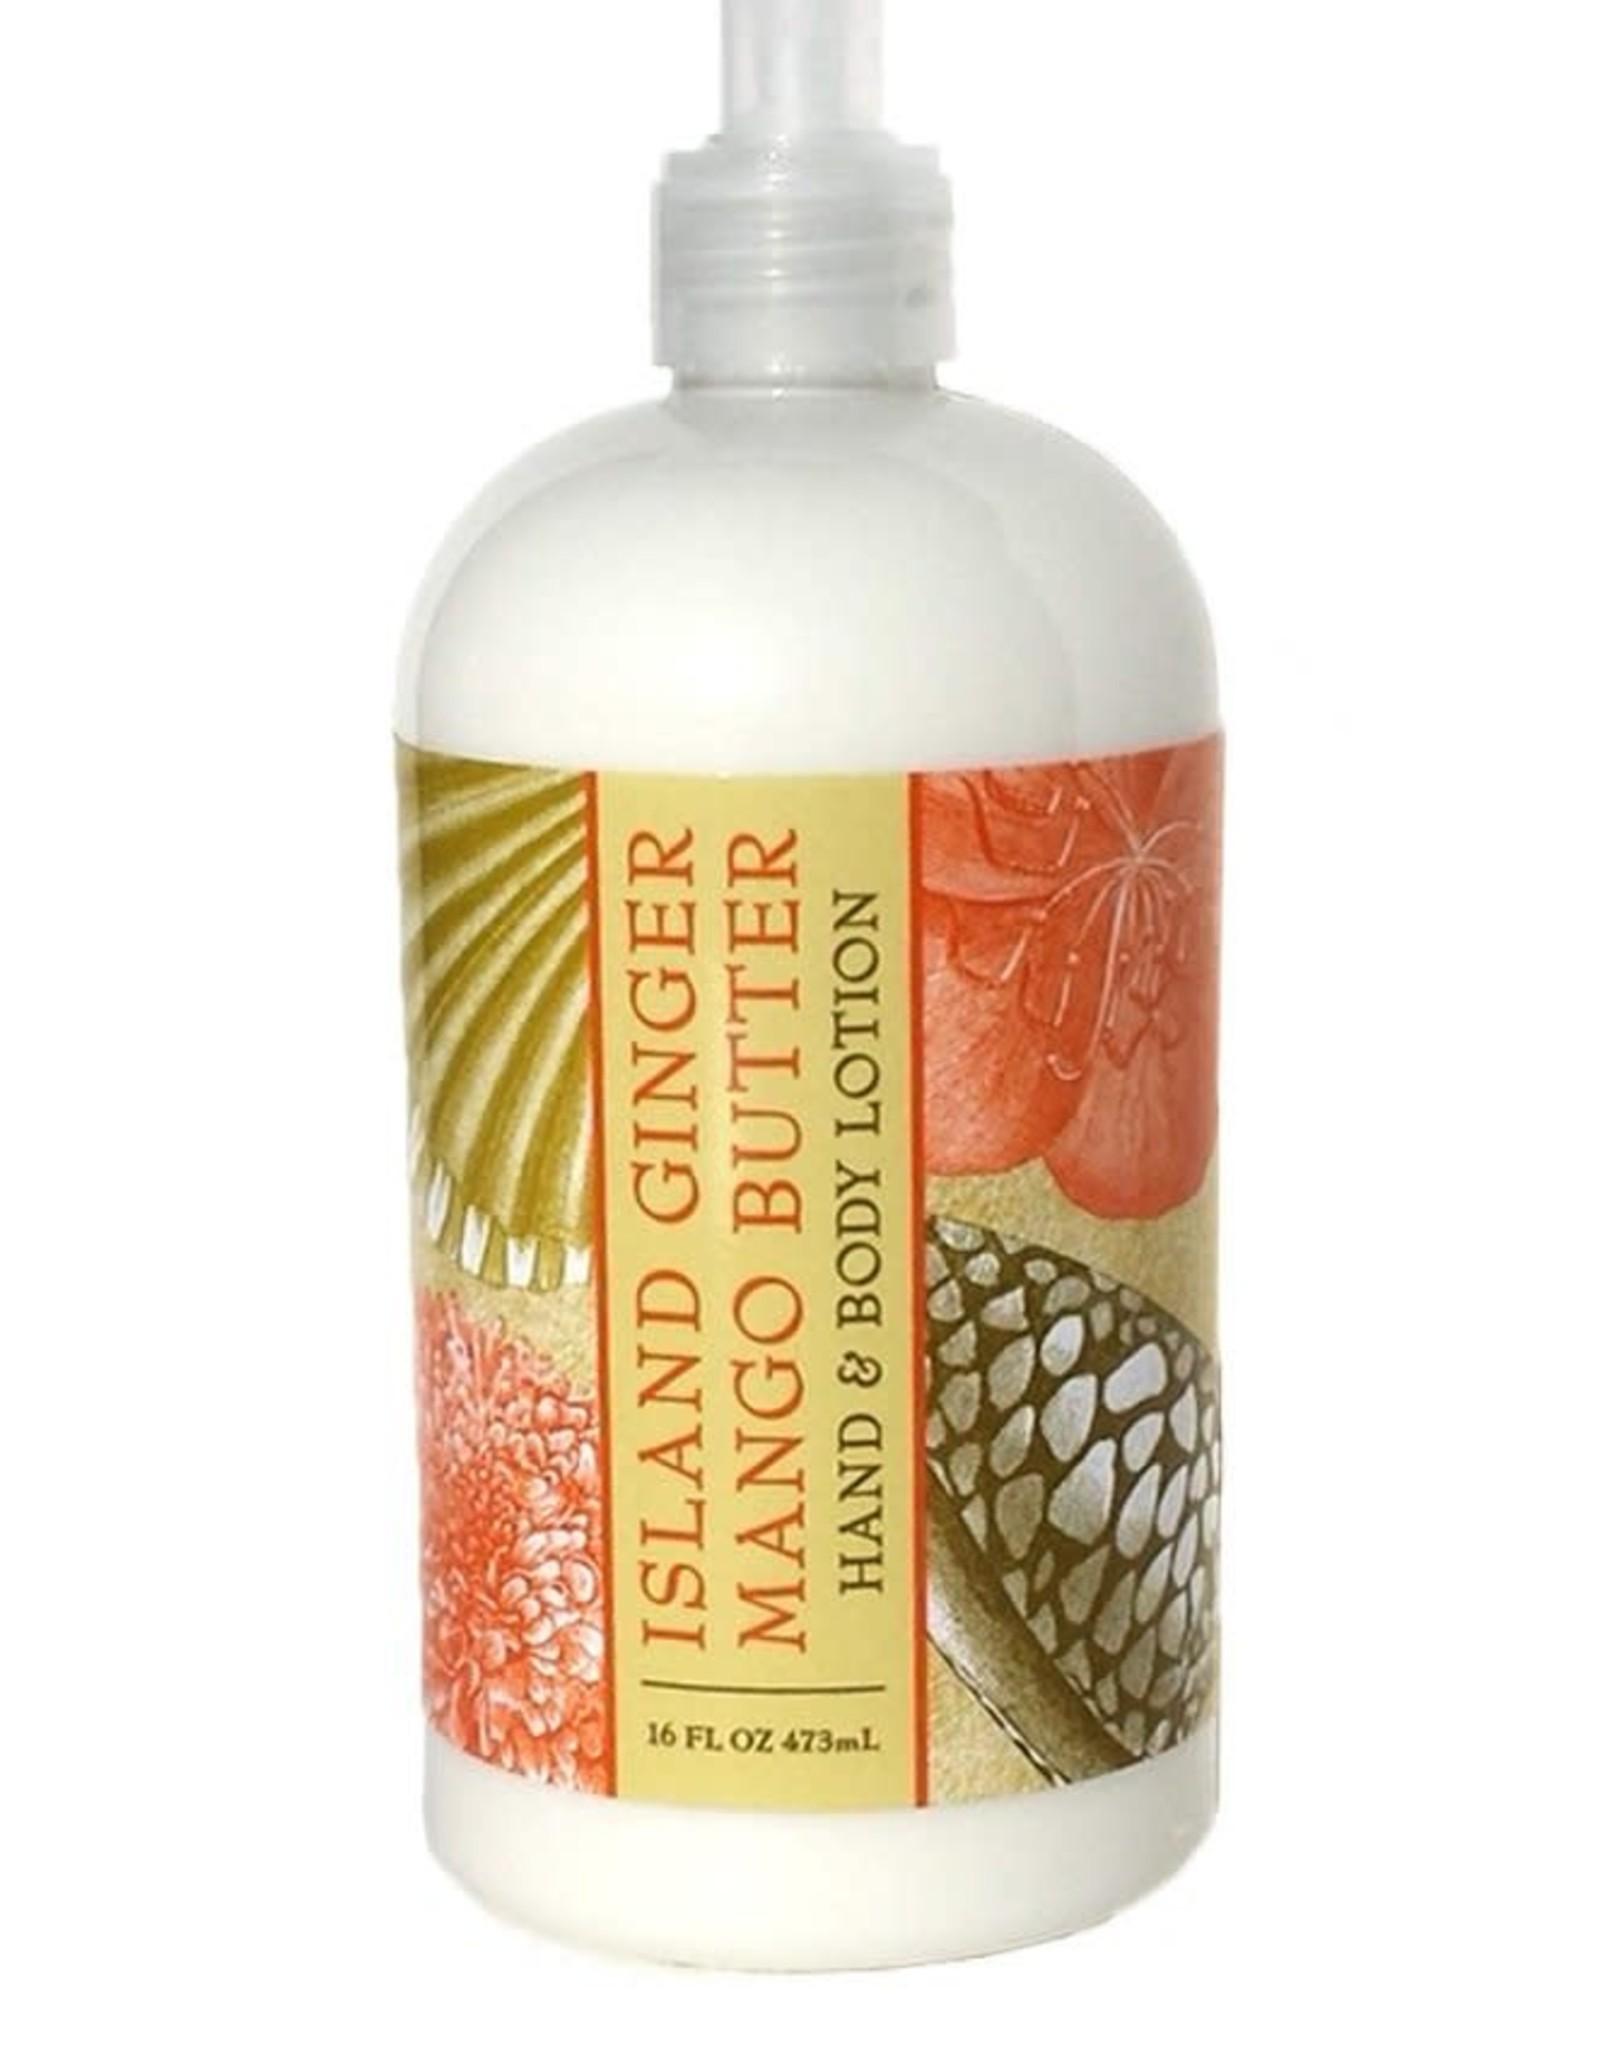 - Island Ginger Mango Butter 16oz Lotion